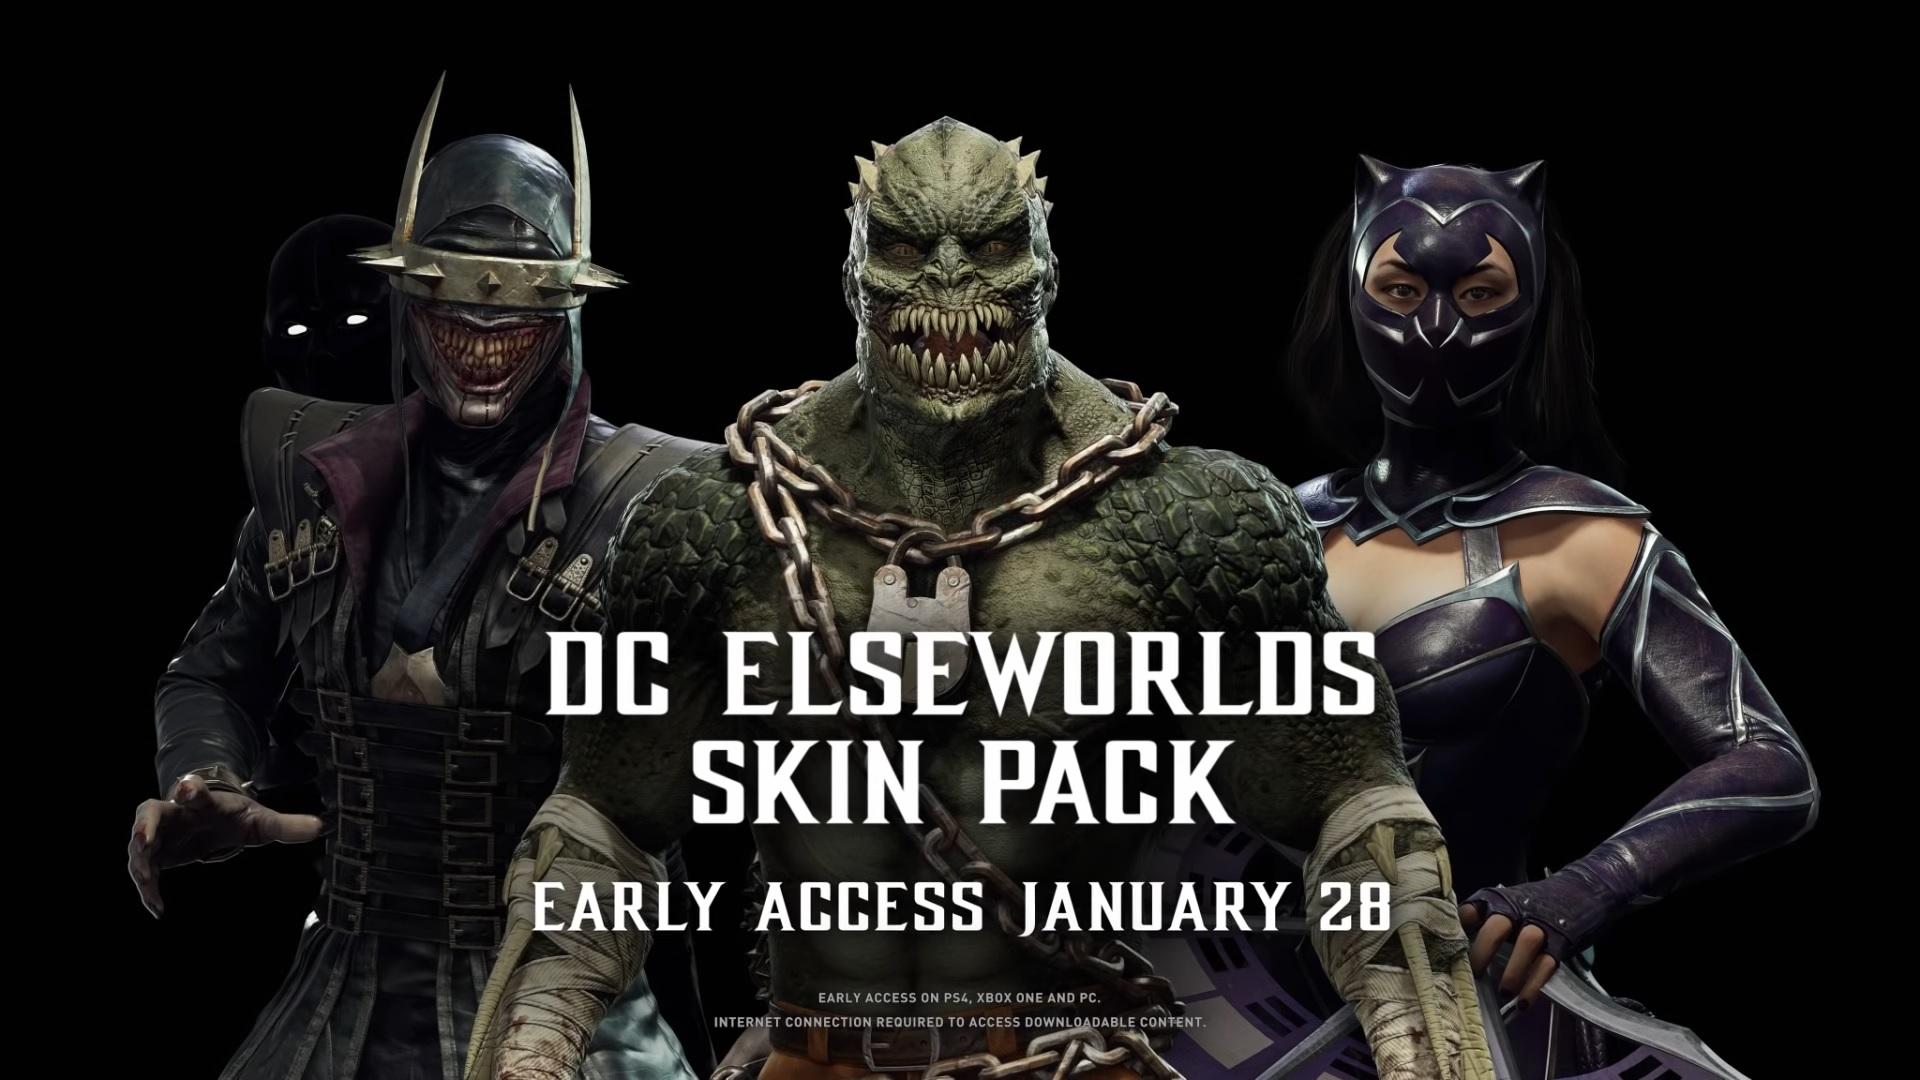 mortal kombat 11 joker dc elseworlds skins